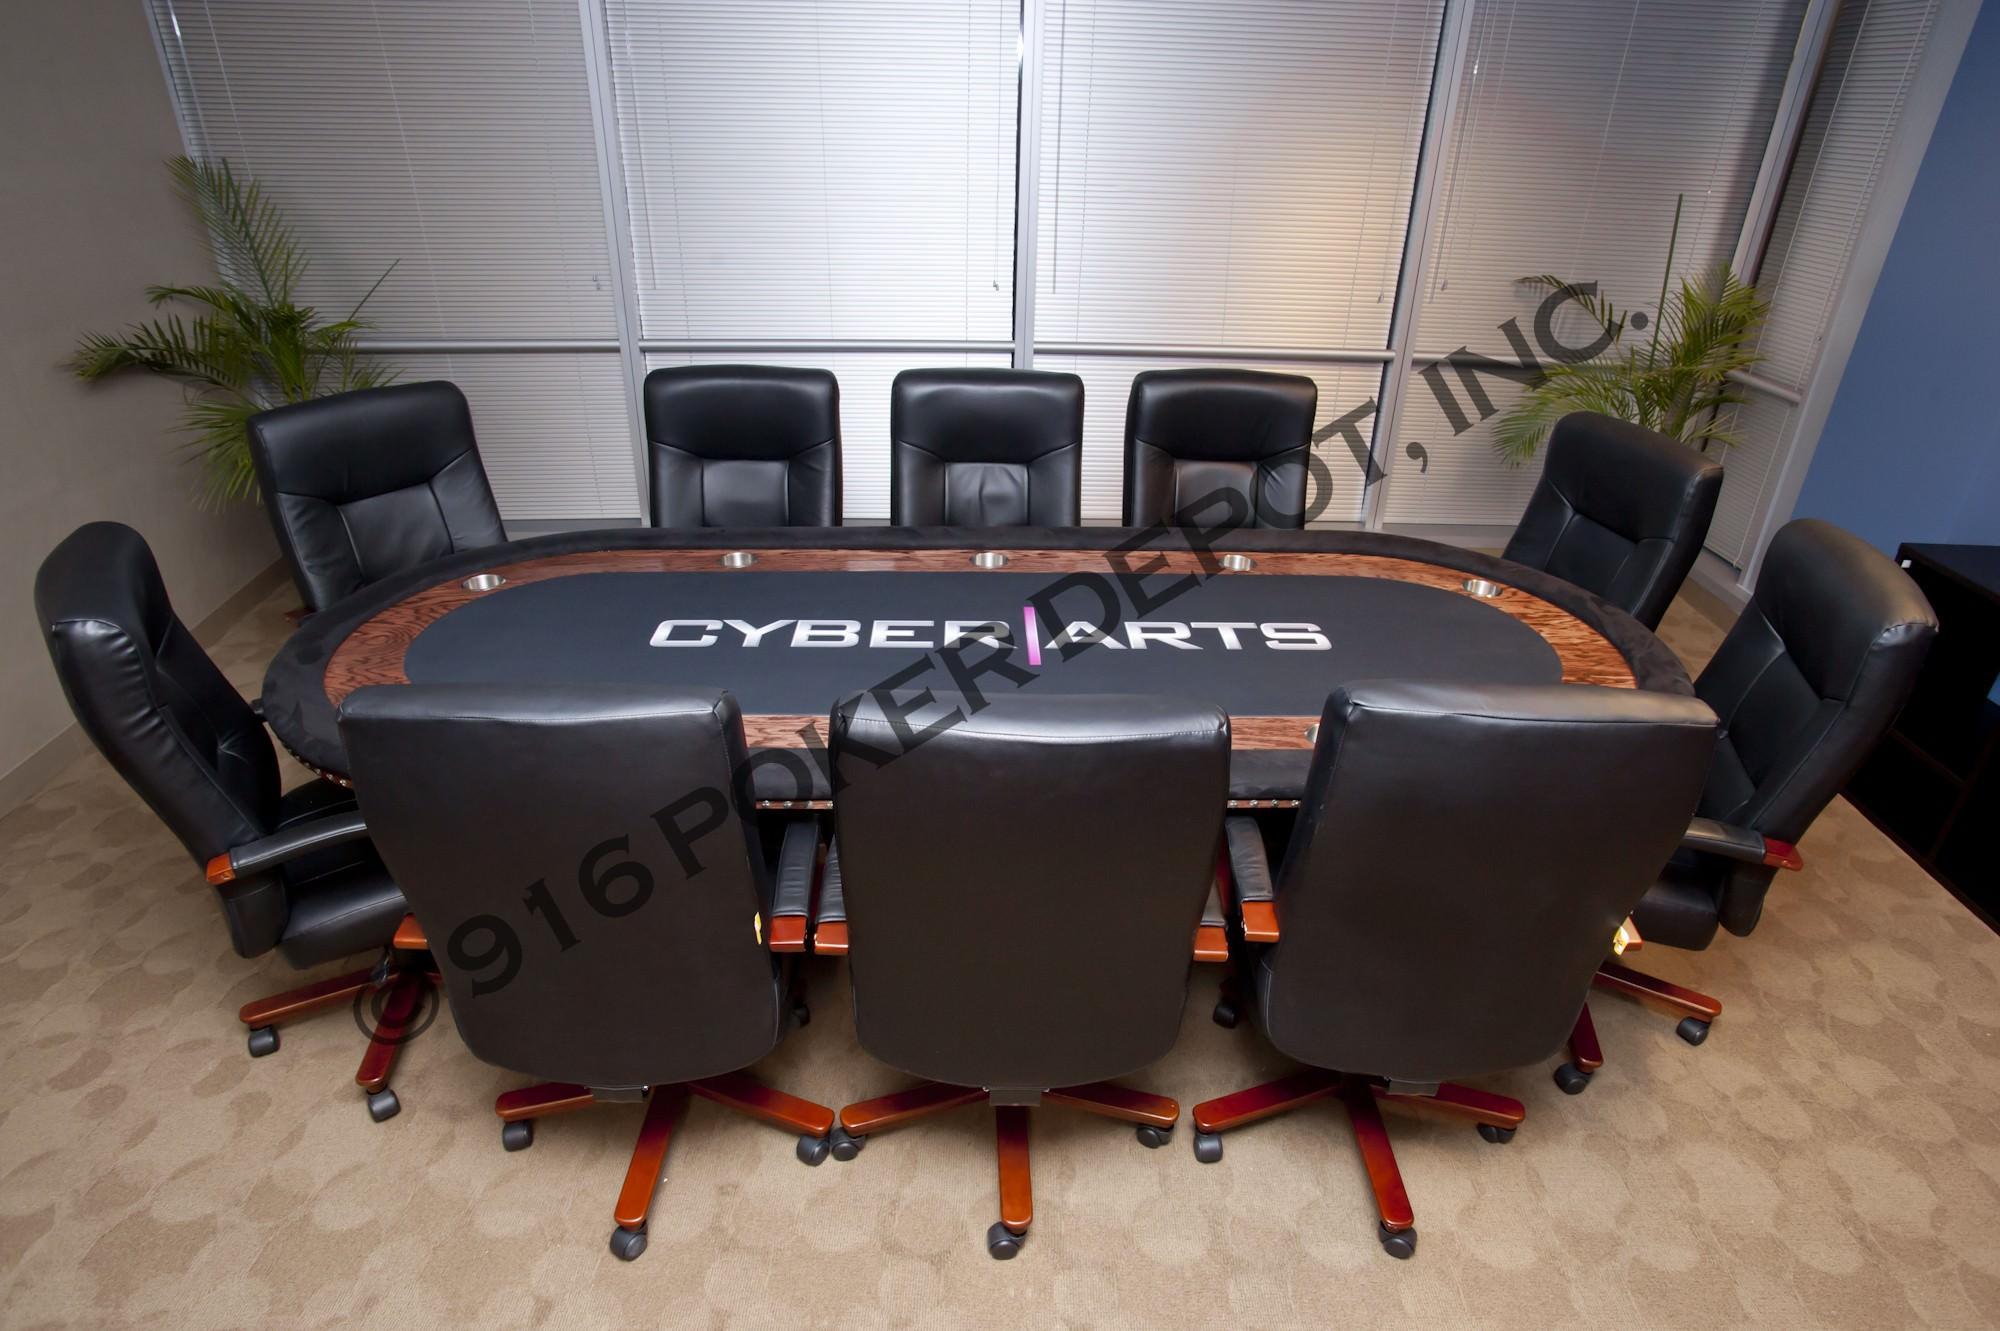 100 custom wood tables tables nampa idaho wood for Furniture nampa idaho